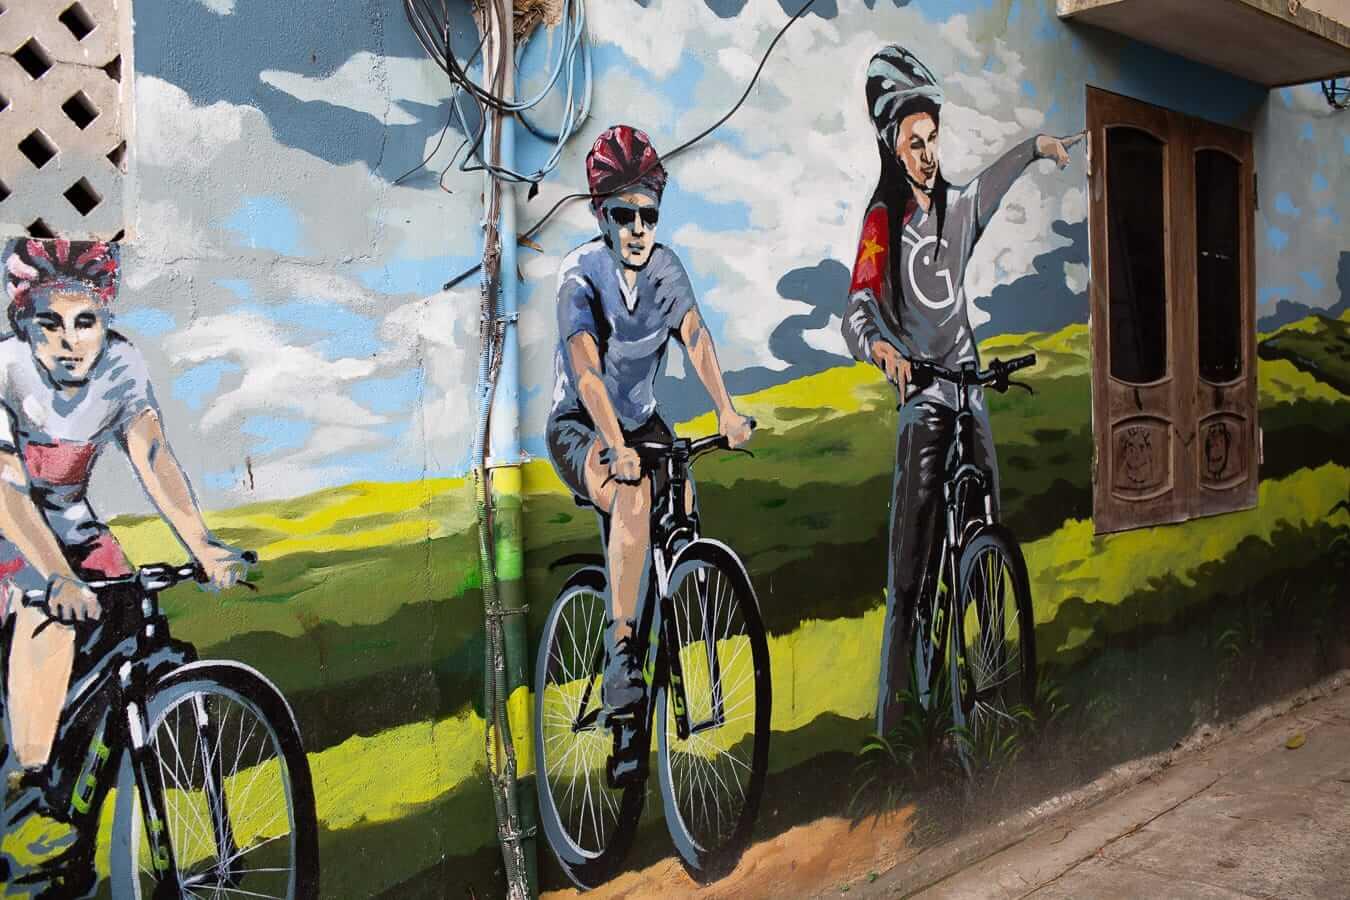 Grasshopper Adventures' office mural: Hoi An Cycling Tours